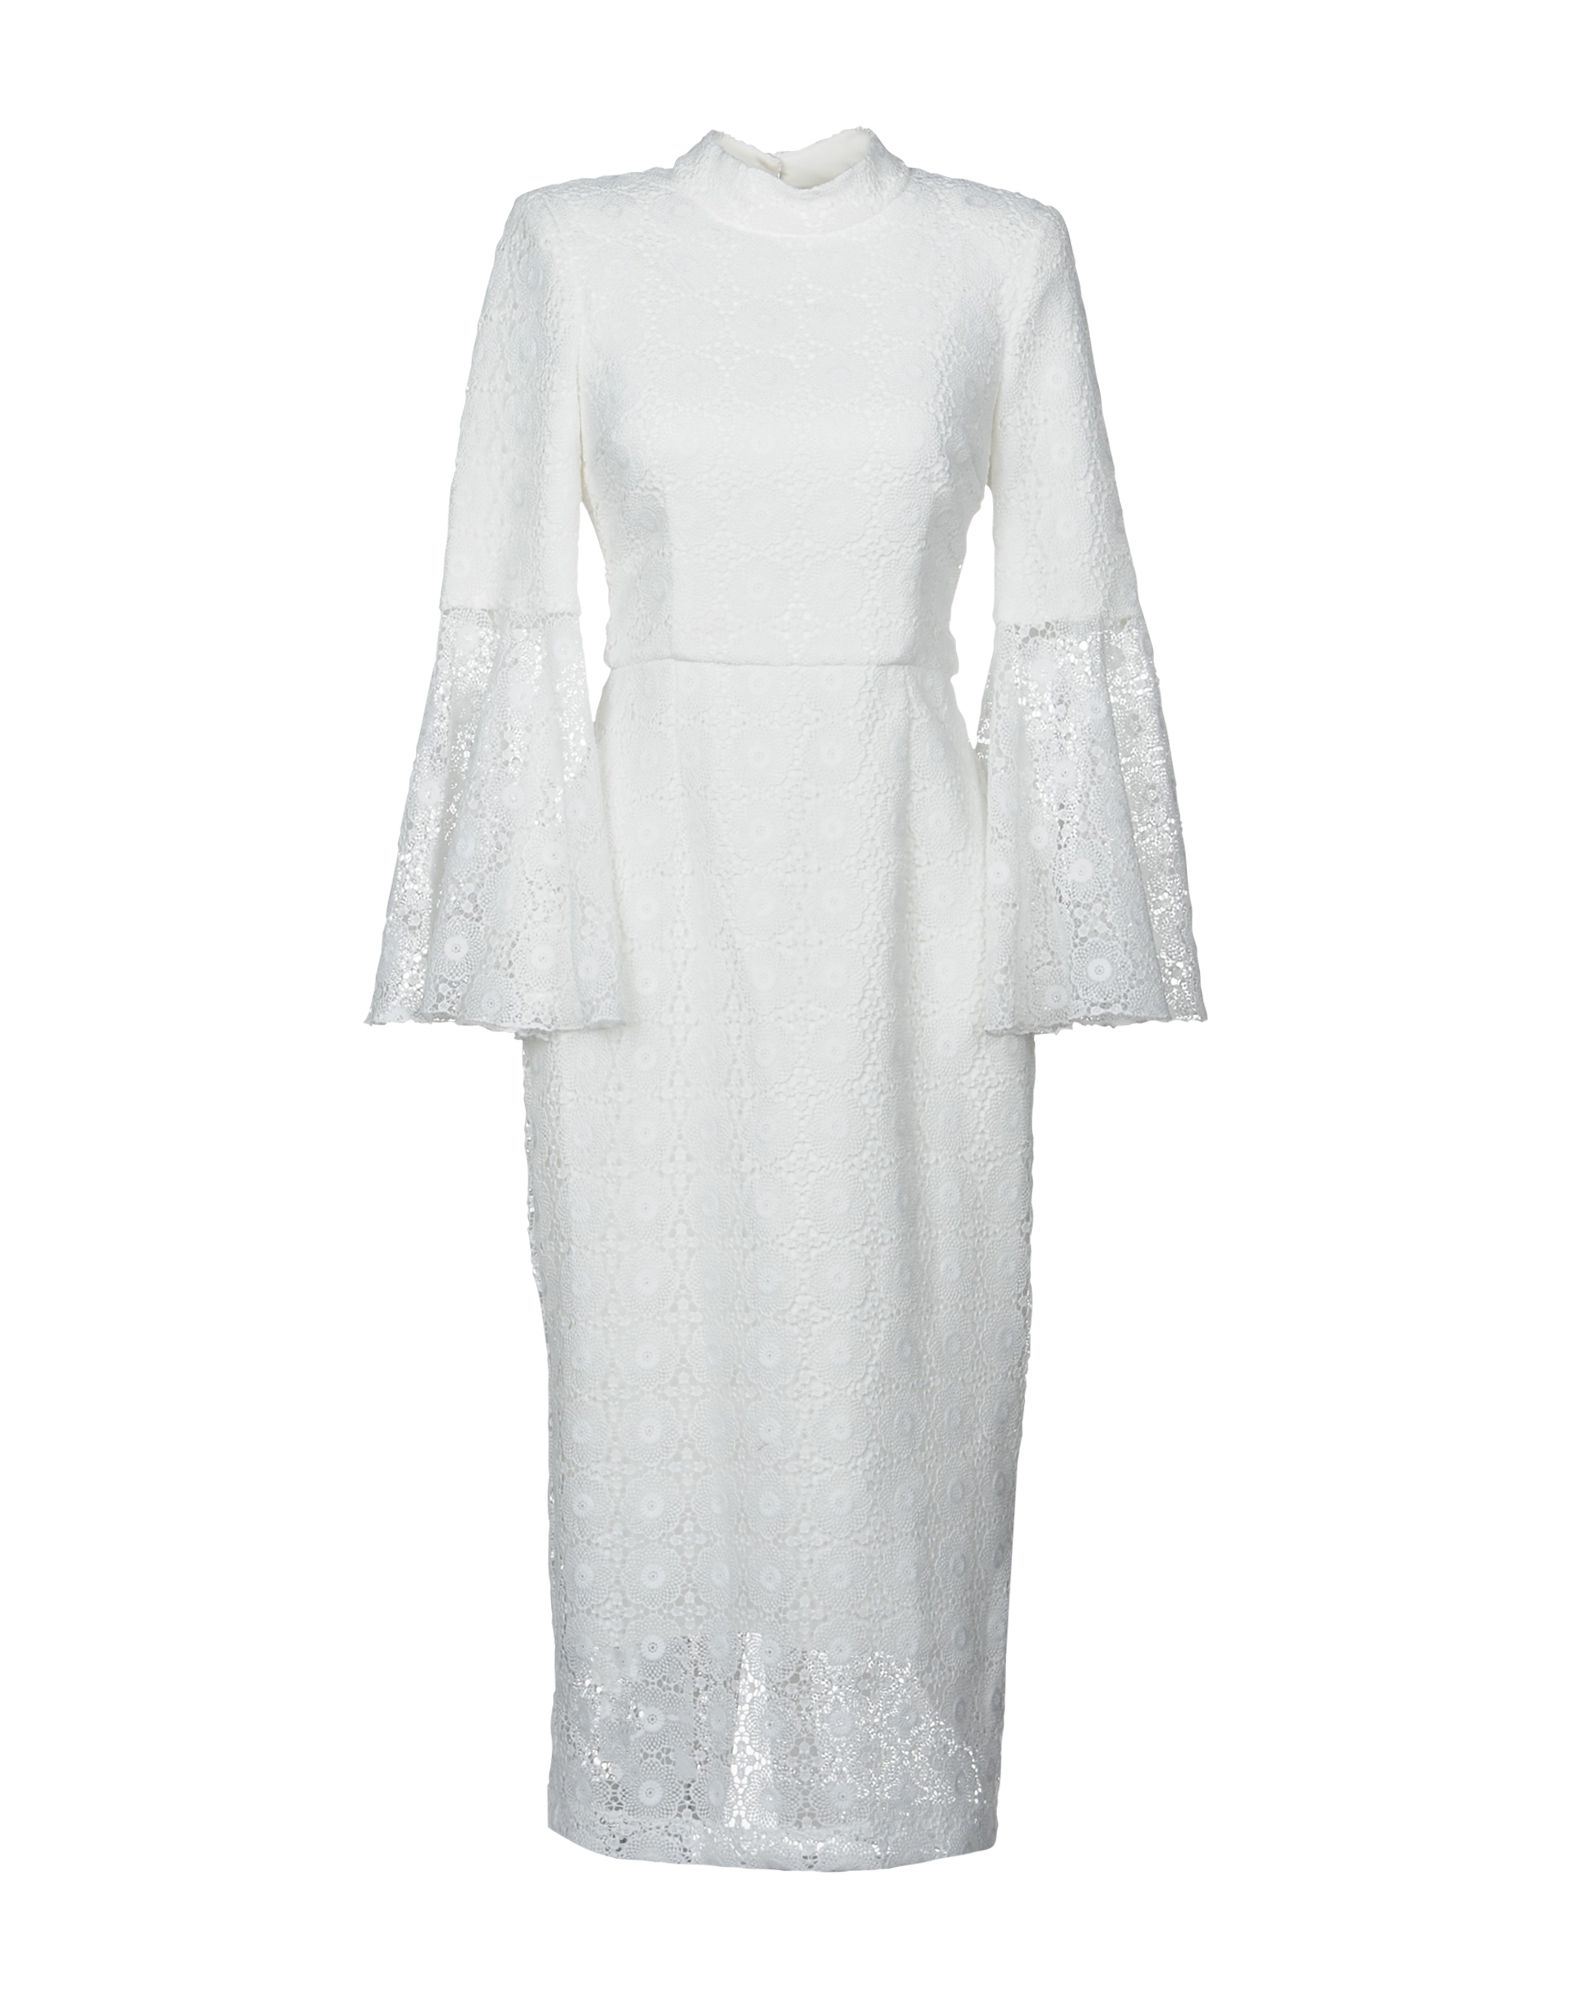 REBECCA VALLANCE Платье длиной 3/4